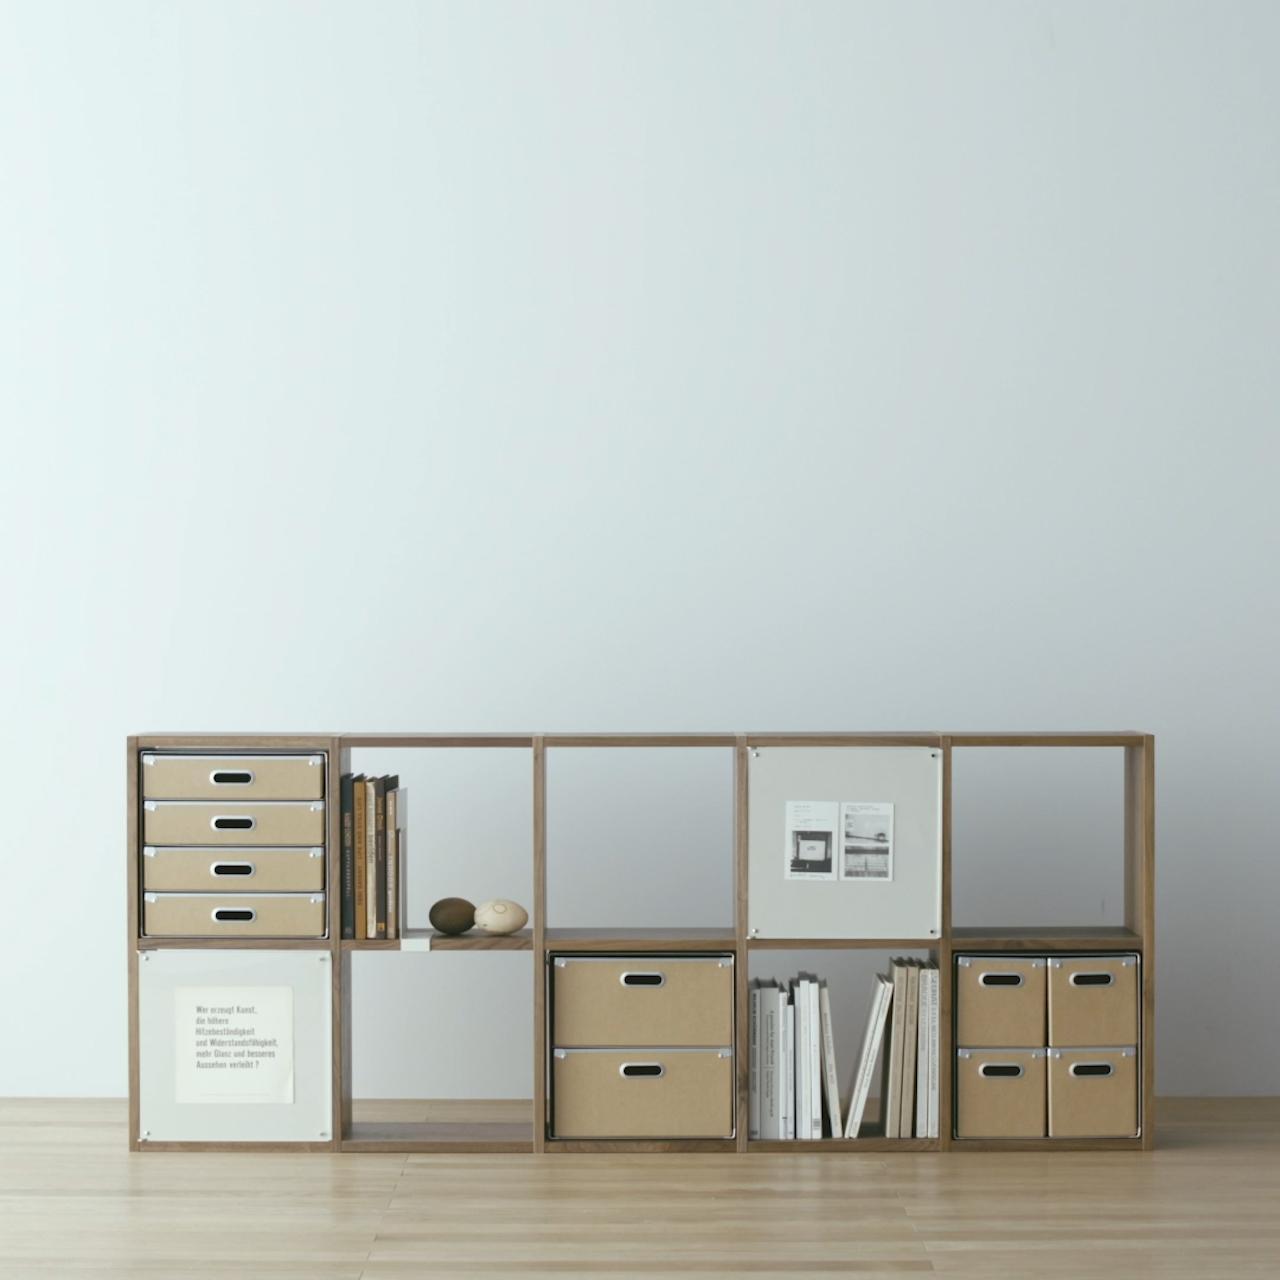 Amazoncom LoveKANKEI Rustic Floating Book Shelves Wall